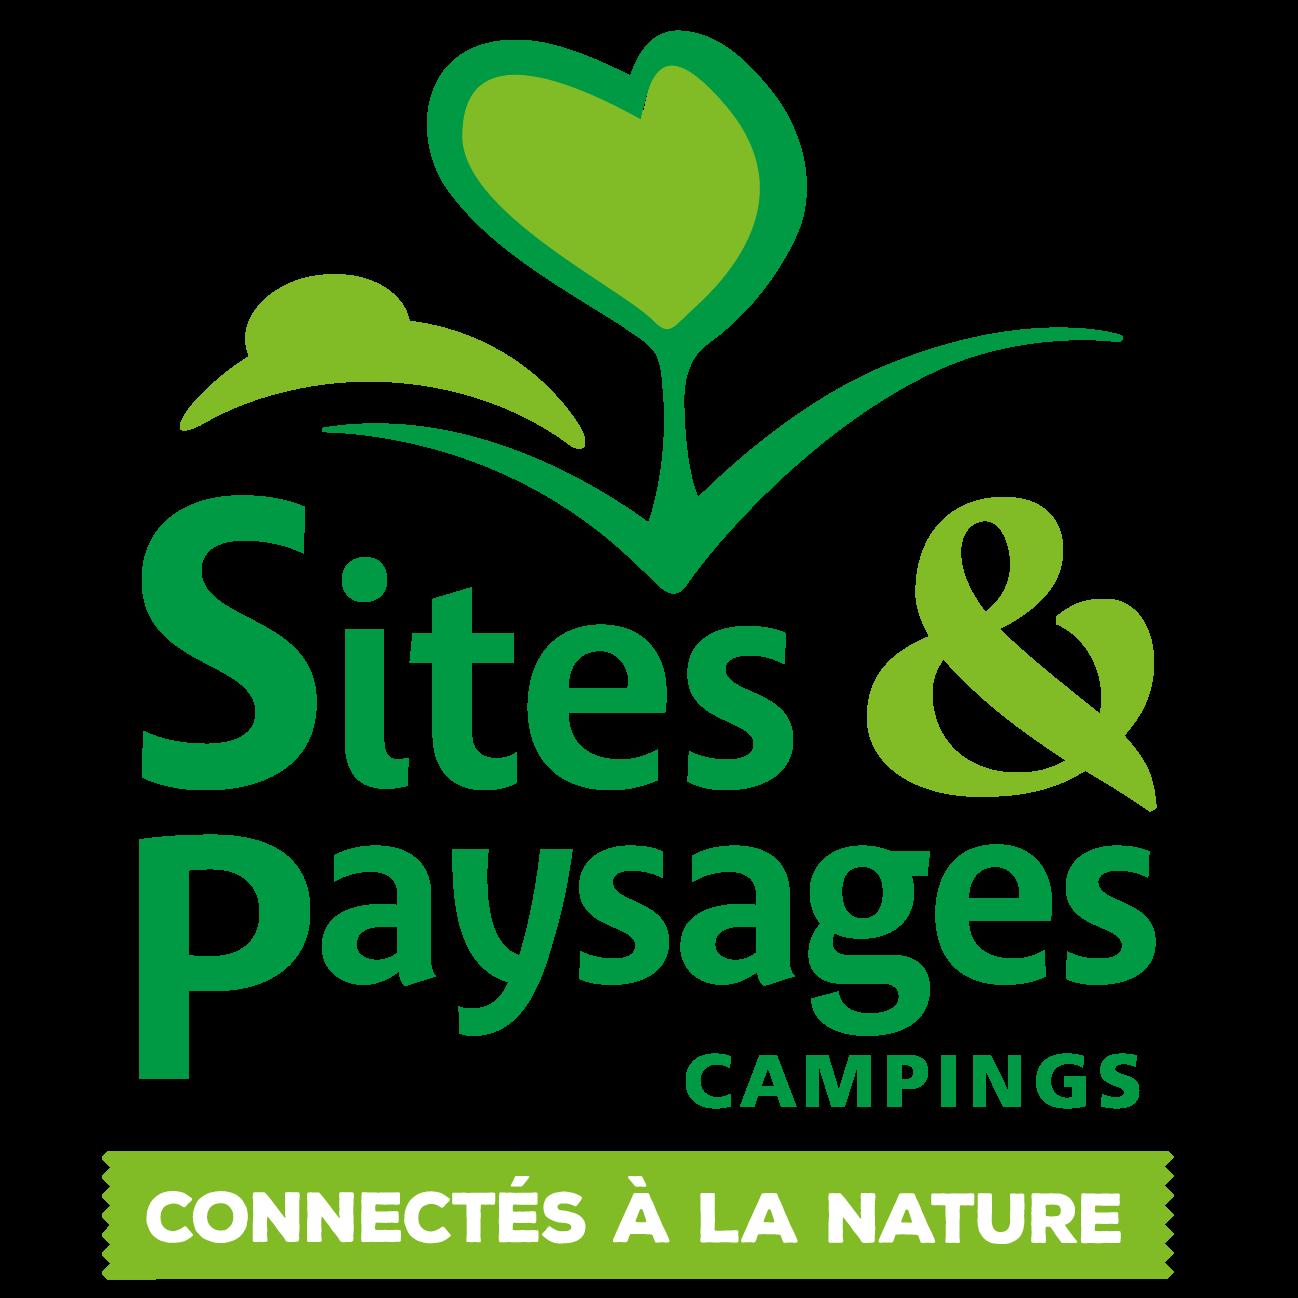 logo campings sites et paysages